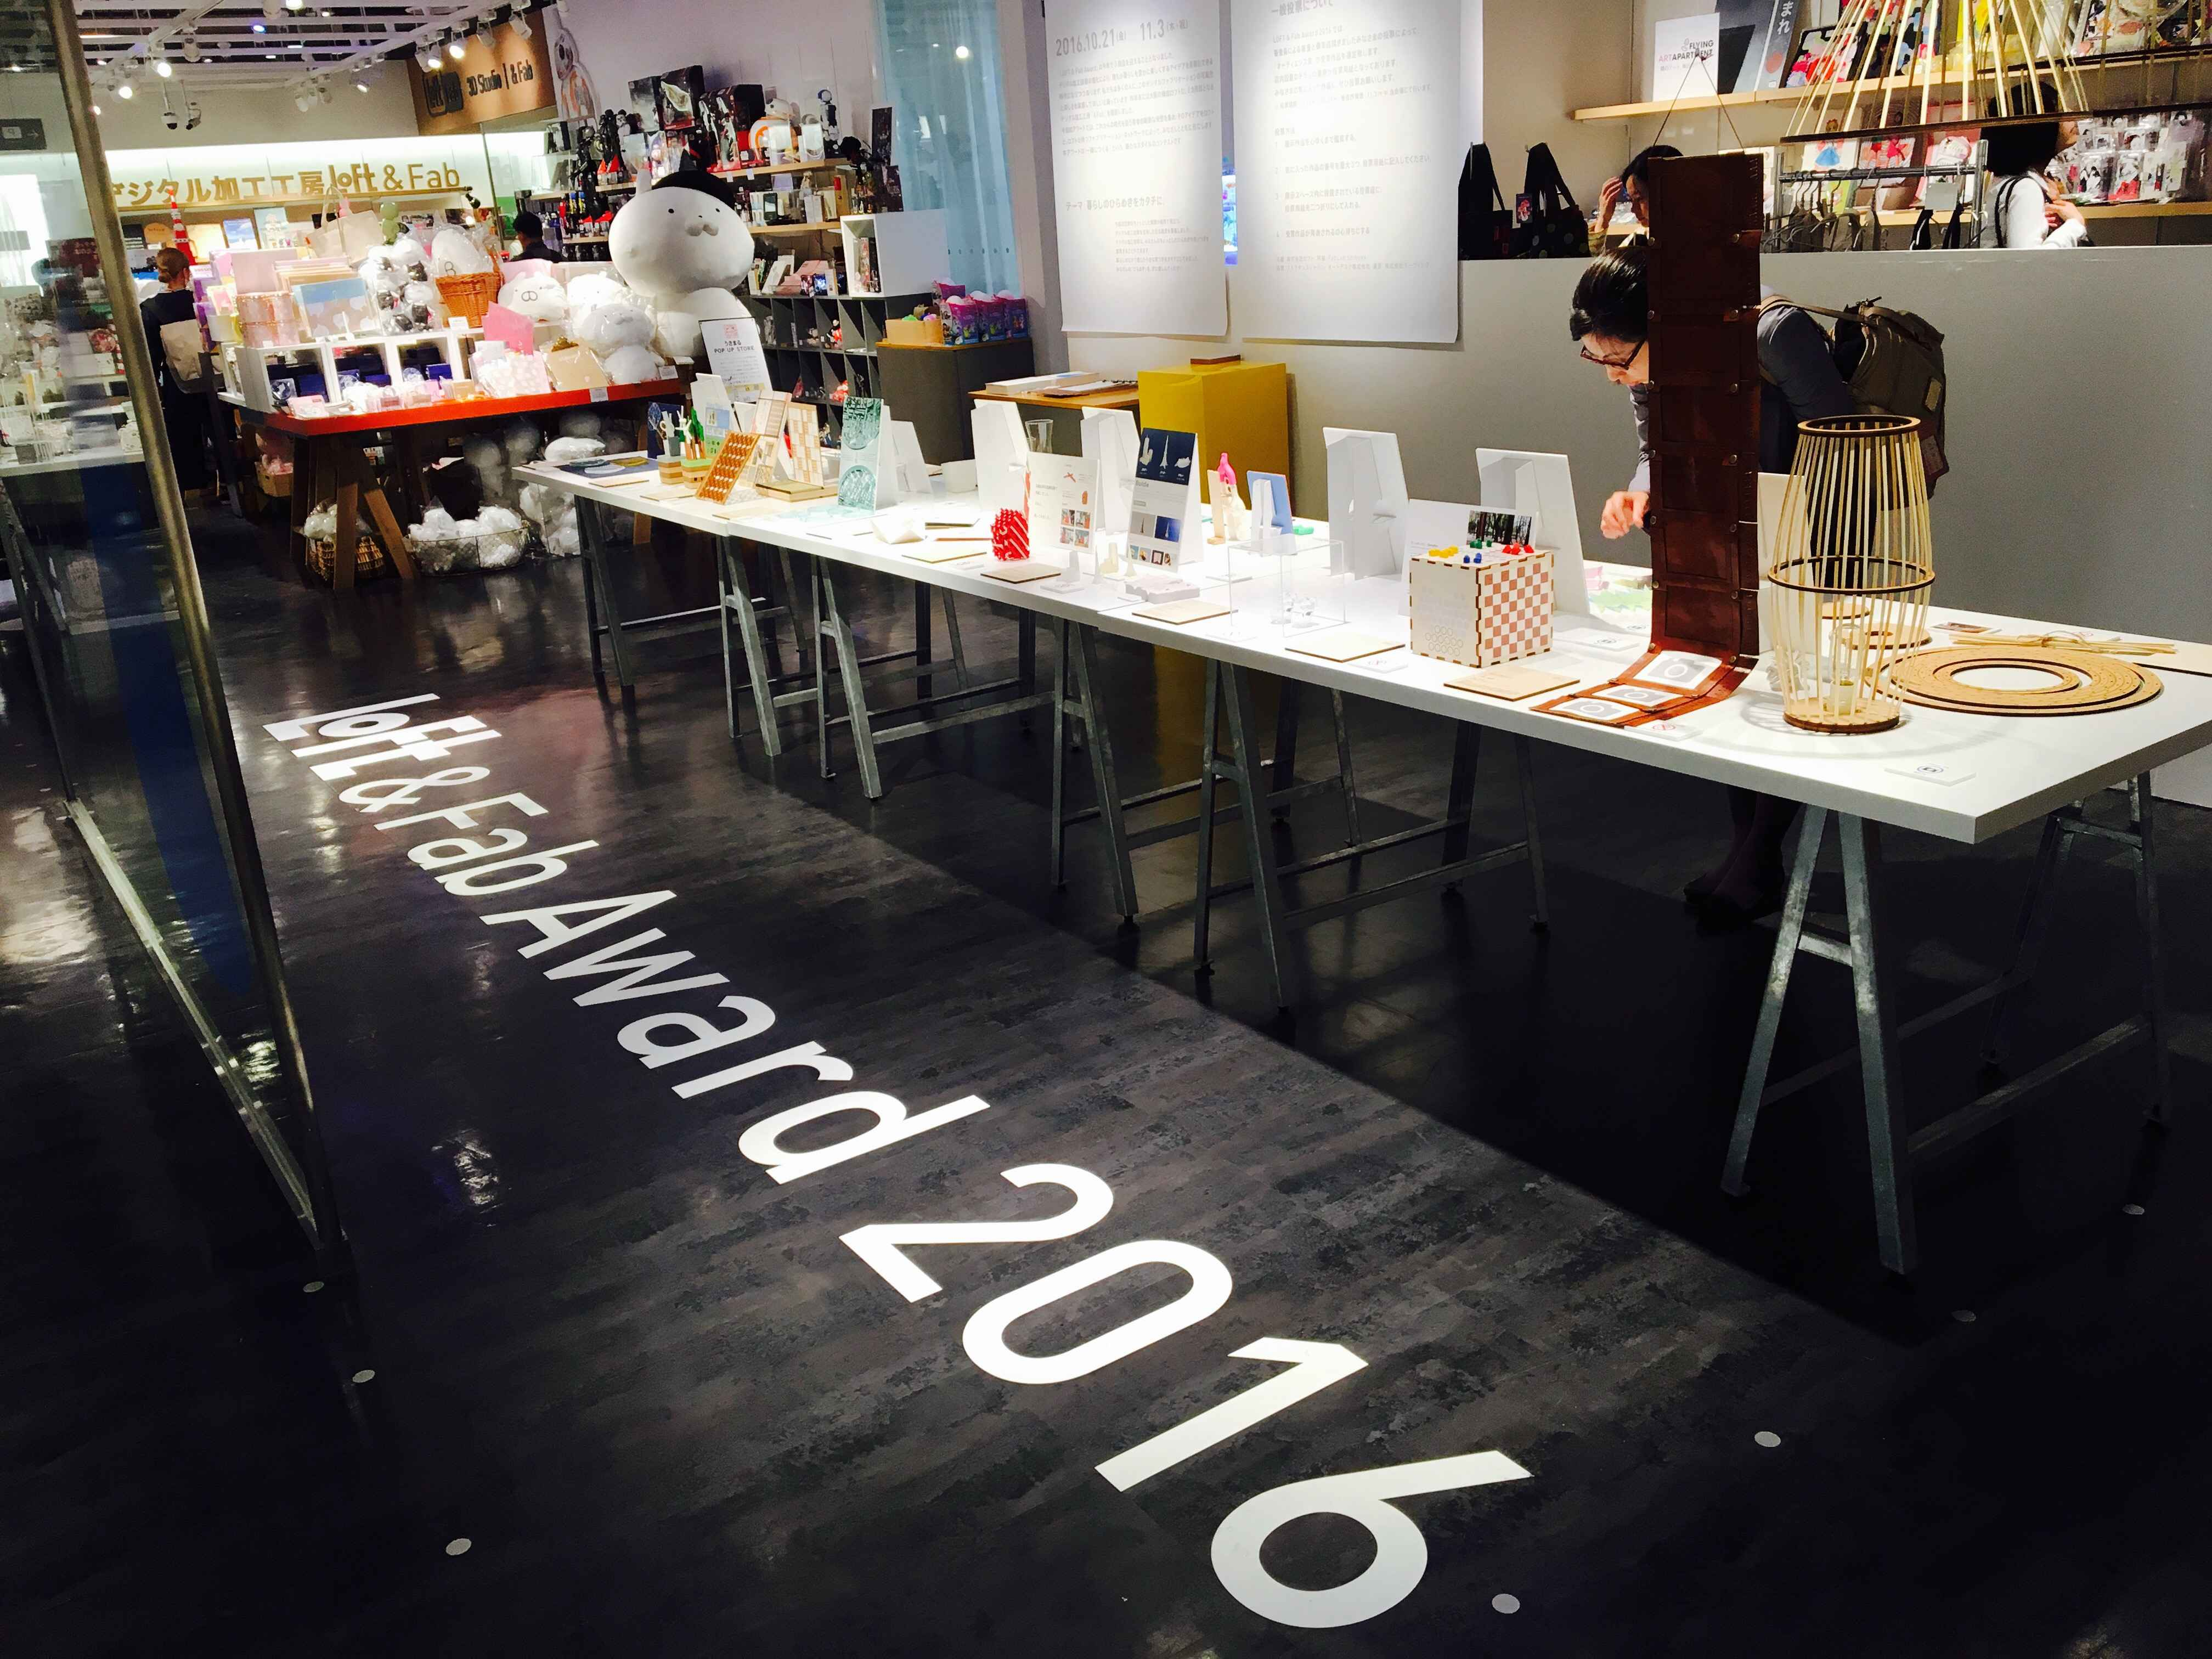 【EncodeRing】渋谷ロフトで開催中のコンテスト『LoFt&FabAward2016』